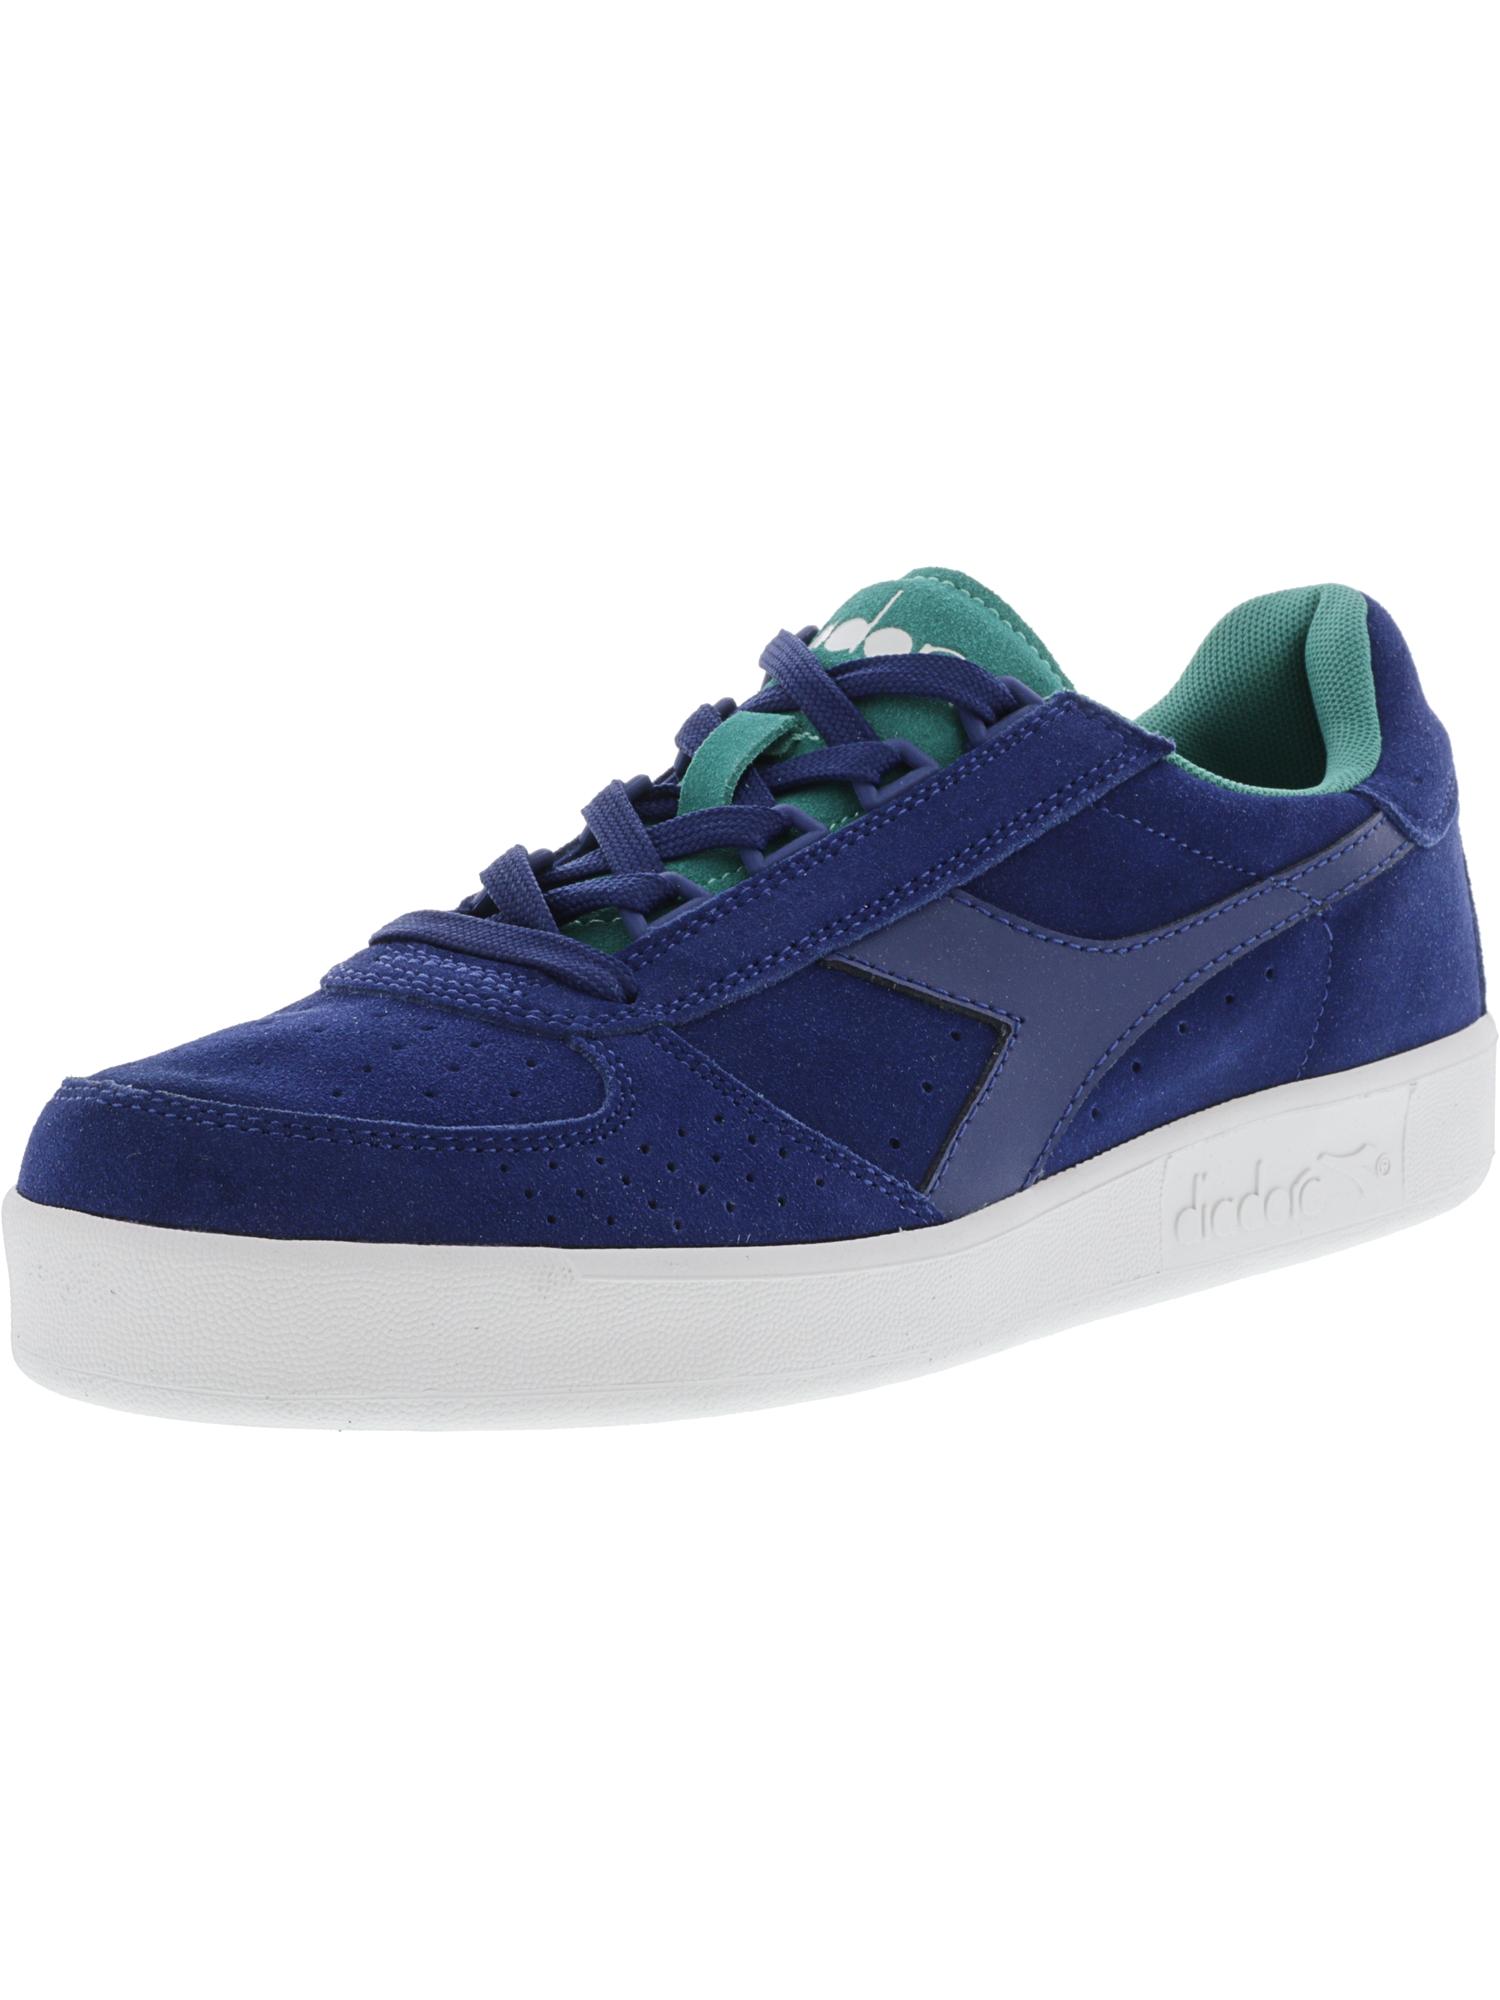 Diadora Men's B Elite Suede Estate Blue / Porcelain Green Ankle-High Fashion Sneaker - 9M